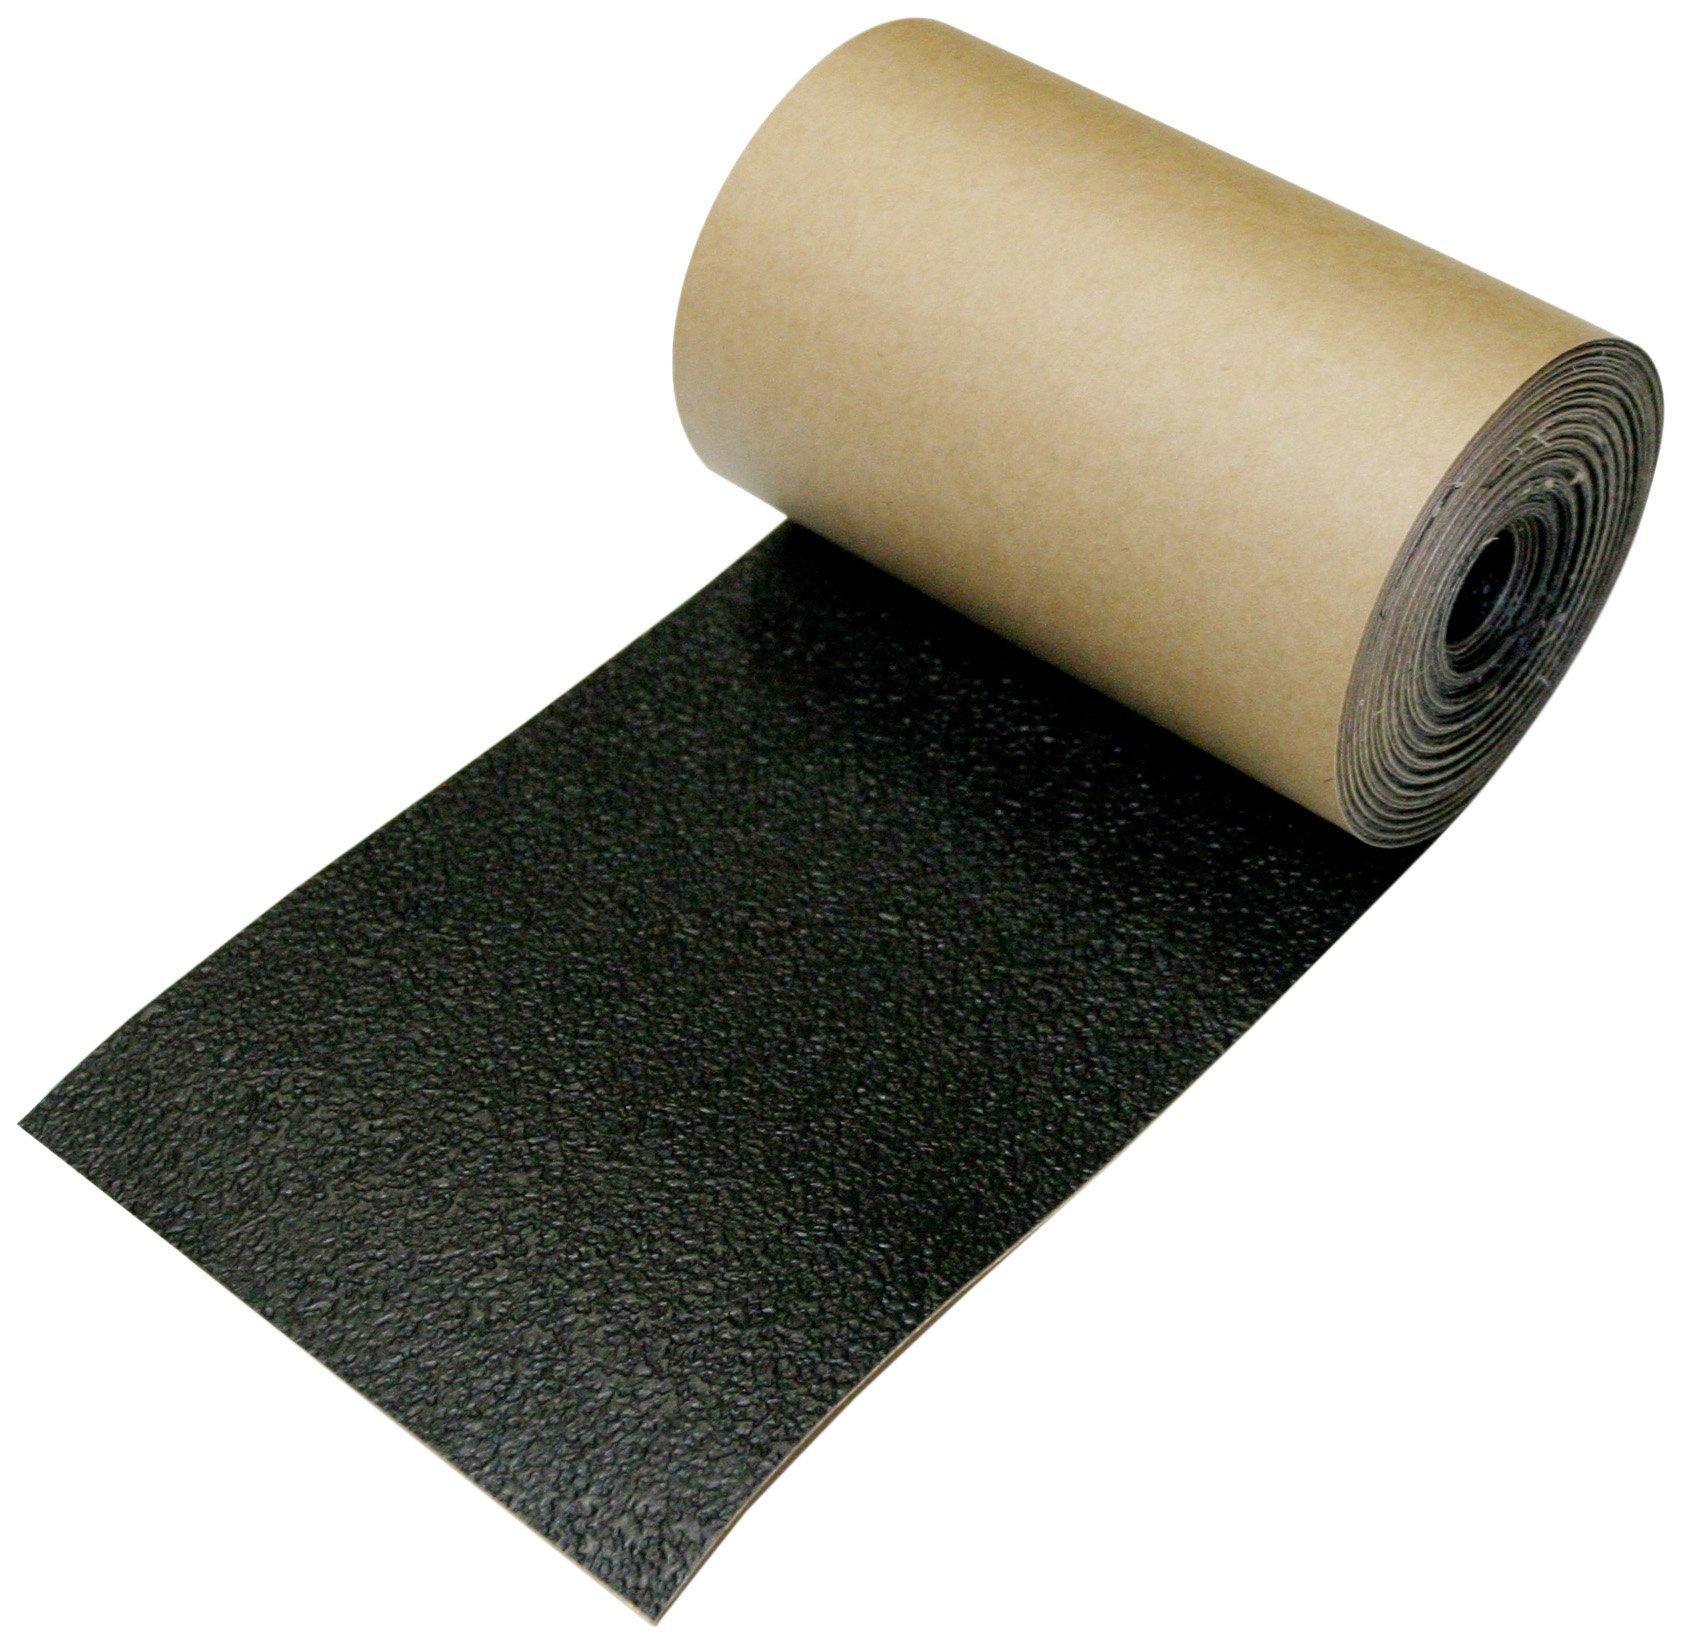 XPEL Black Universal Bed Rail Guard (17' x 4'') Paint Protection Film Kit